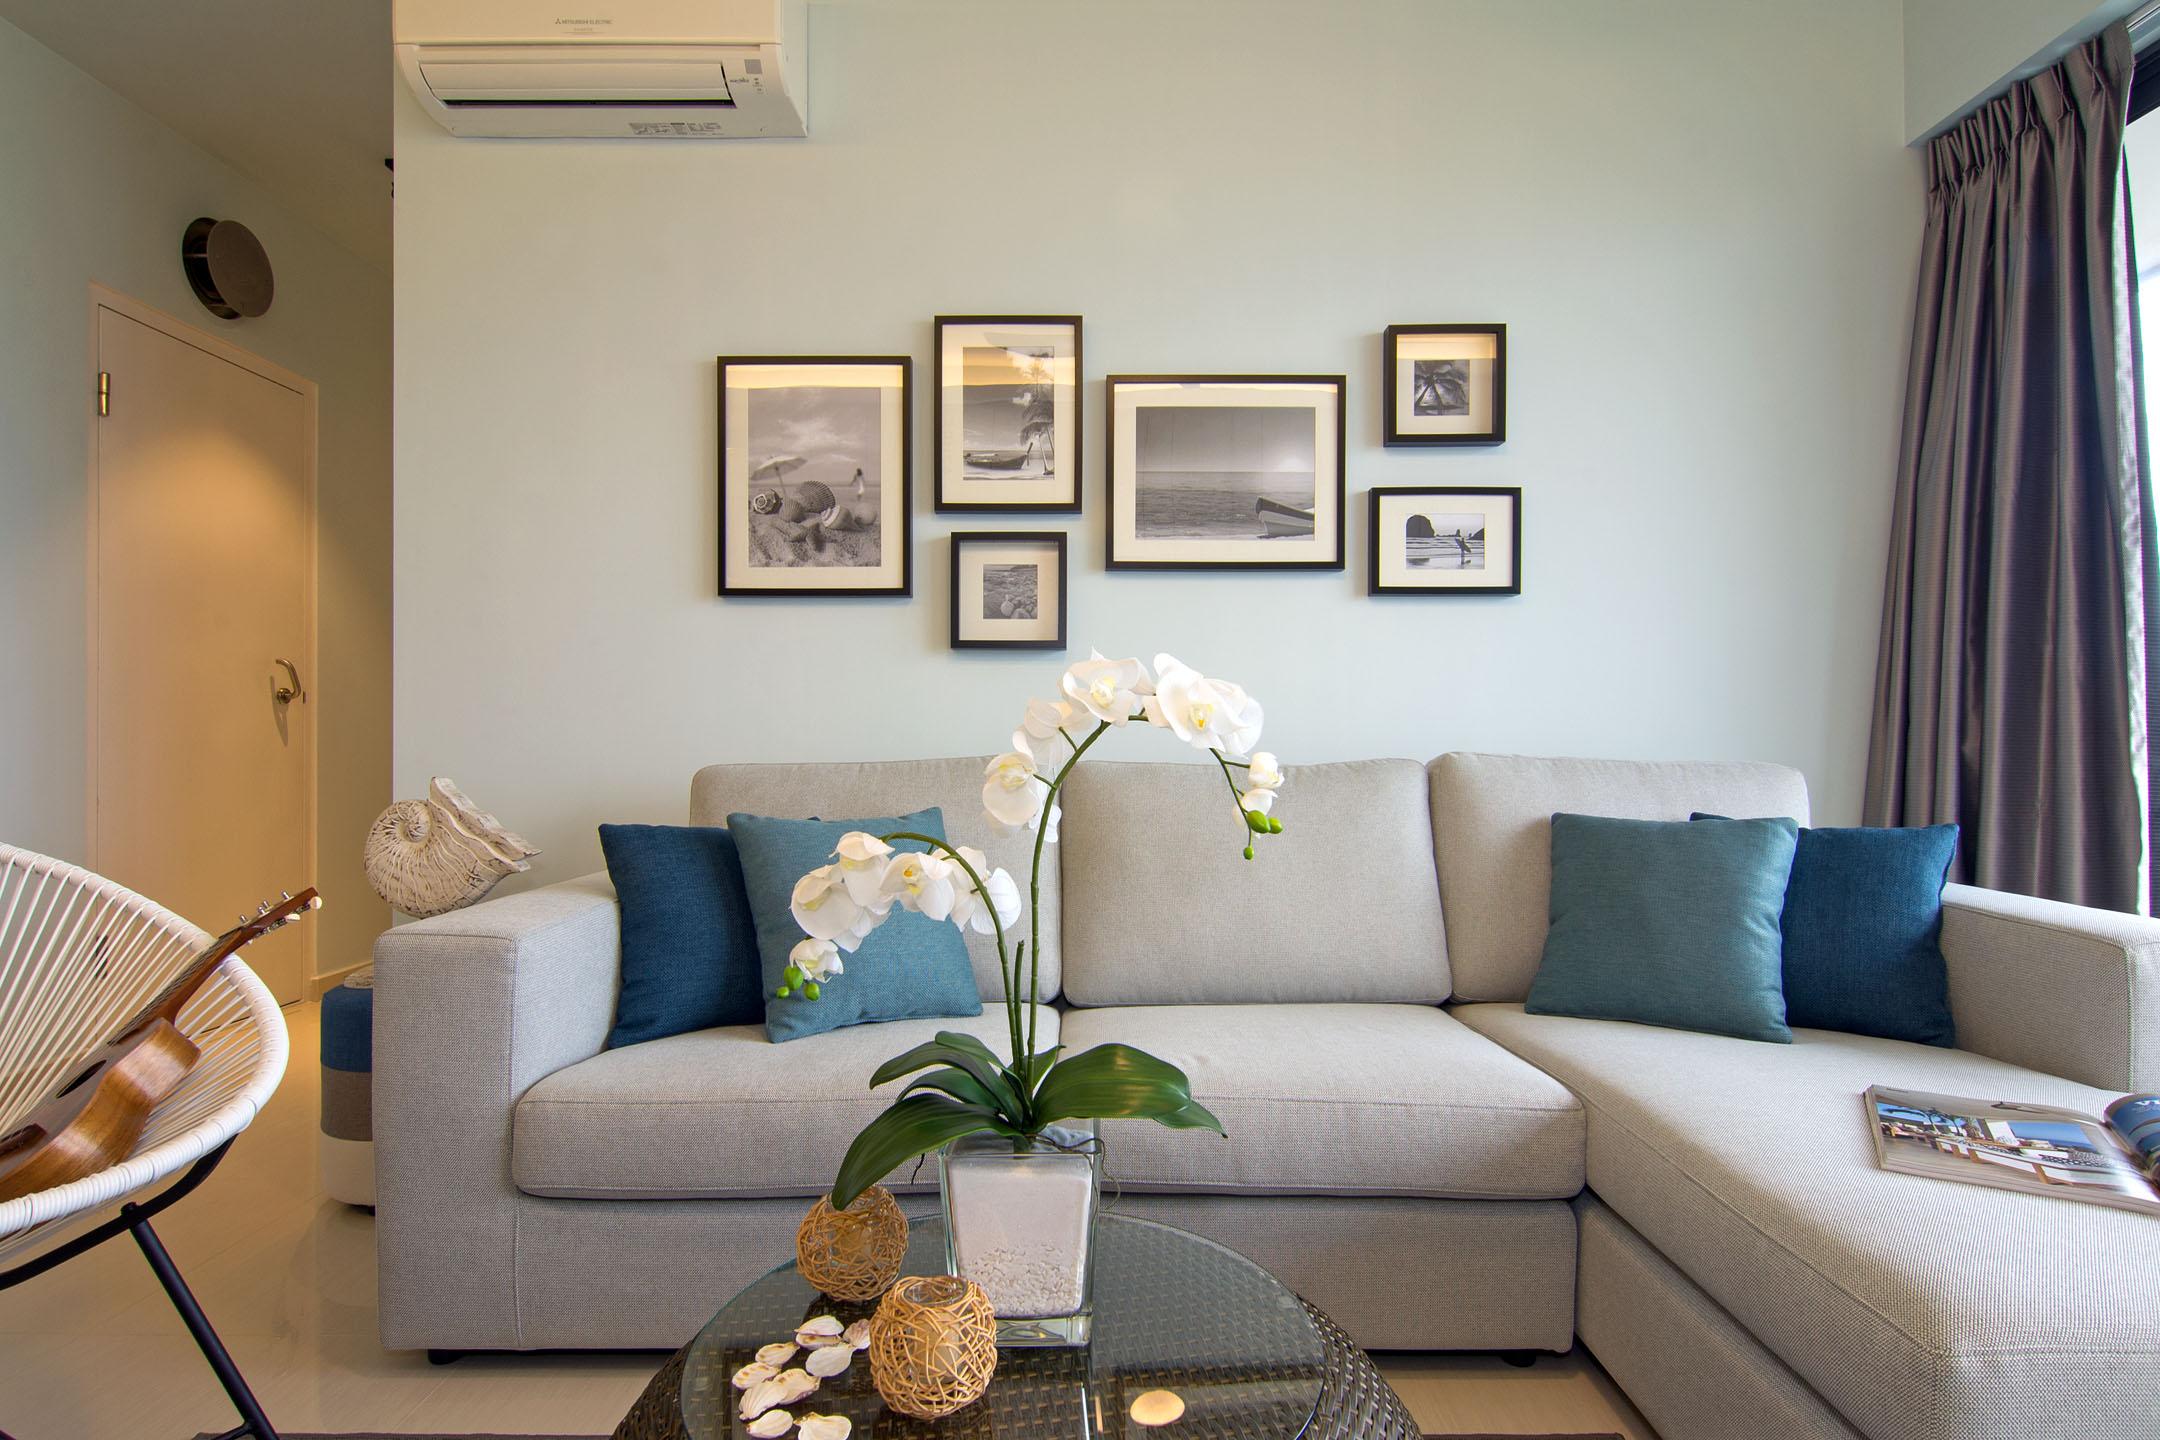 Beach house urban apartment in Singapore by Vievva Designers-07